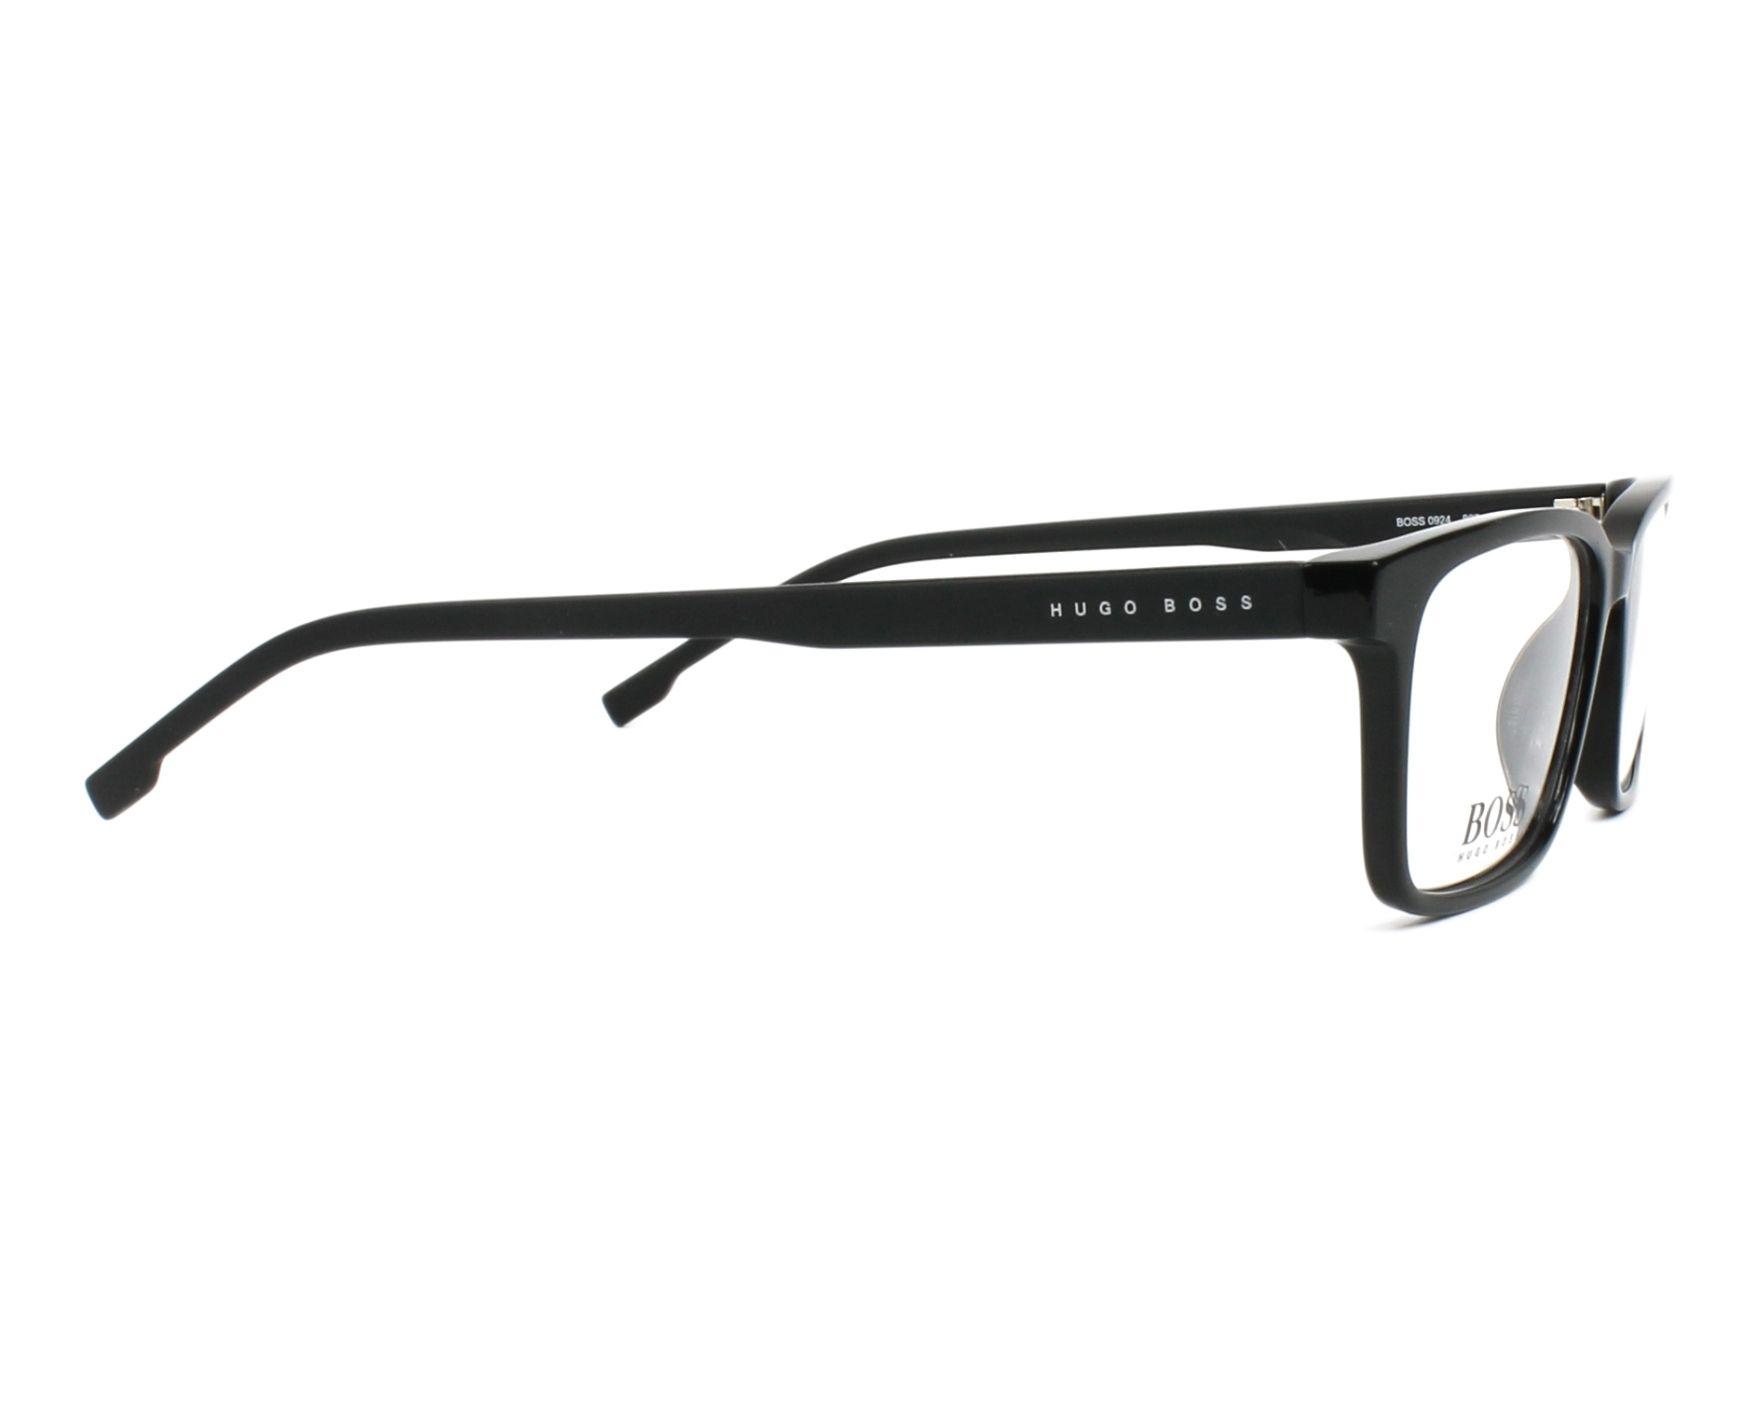 d8a5215cebd eyeglasses Hugo Boss BOSS-0924 807 51-15 Black Black side view